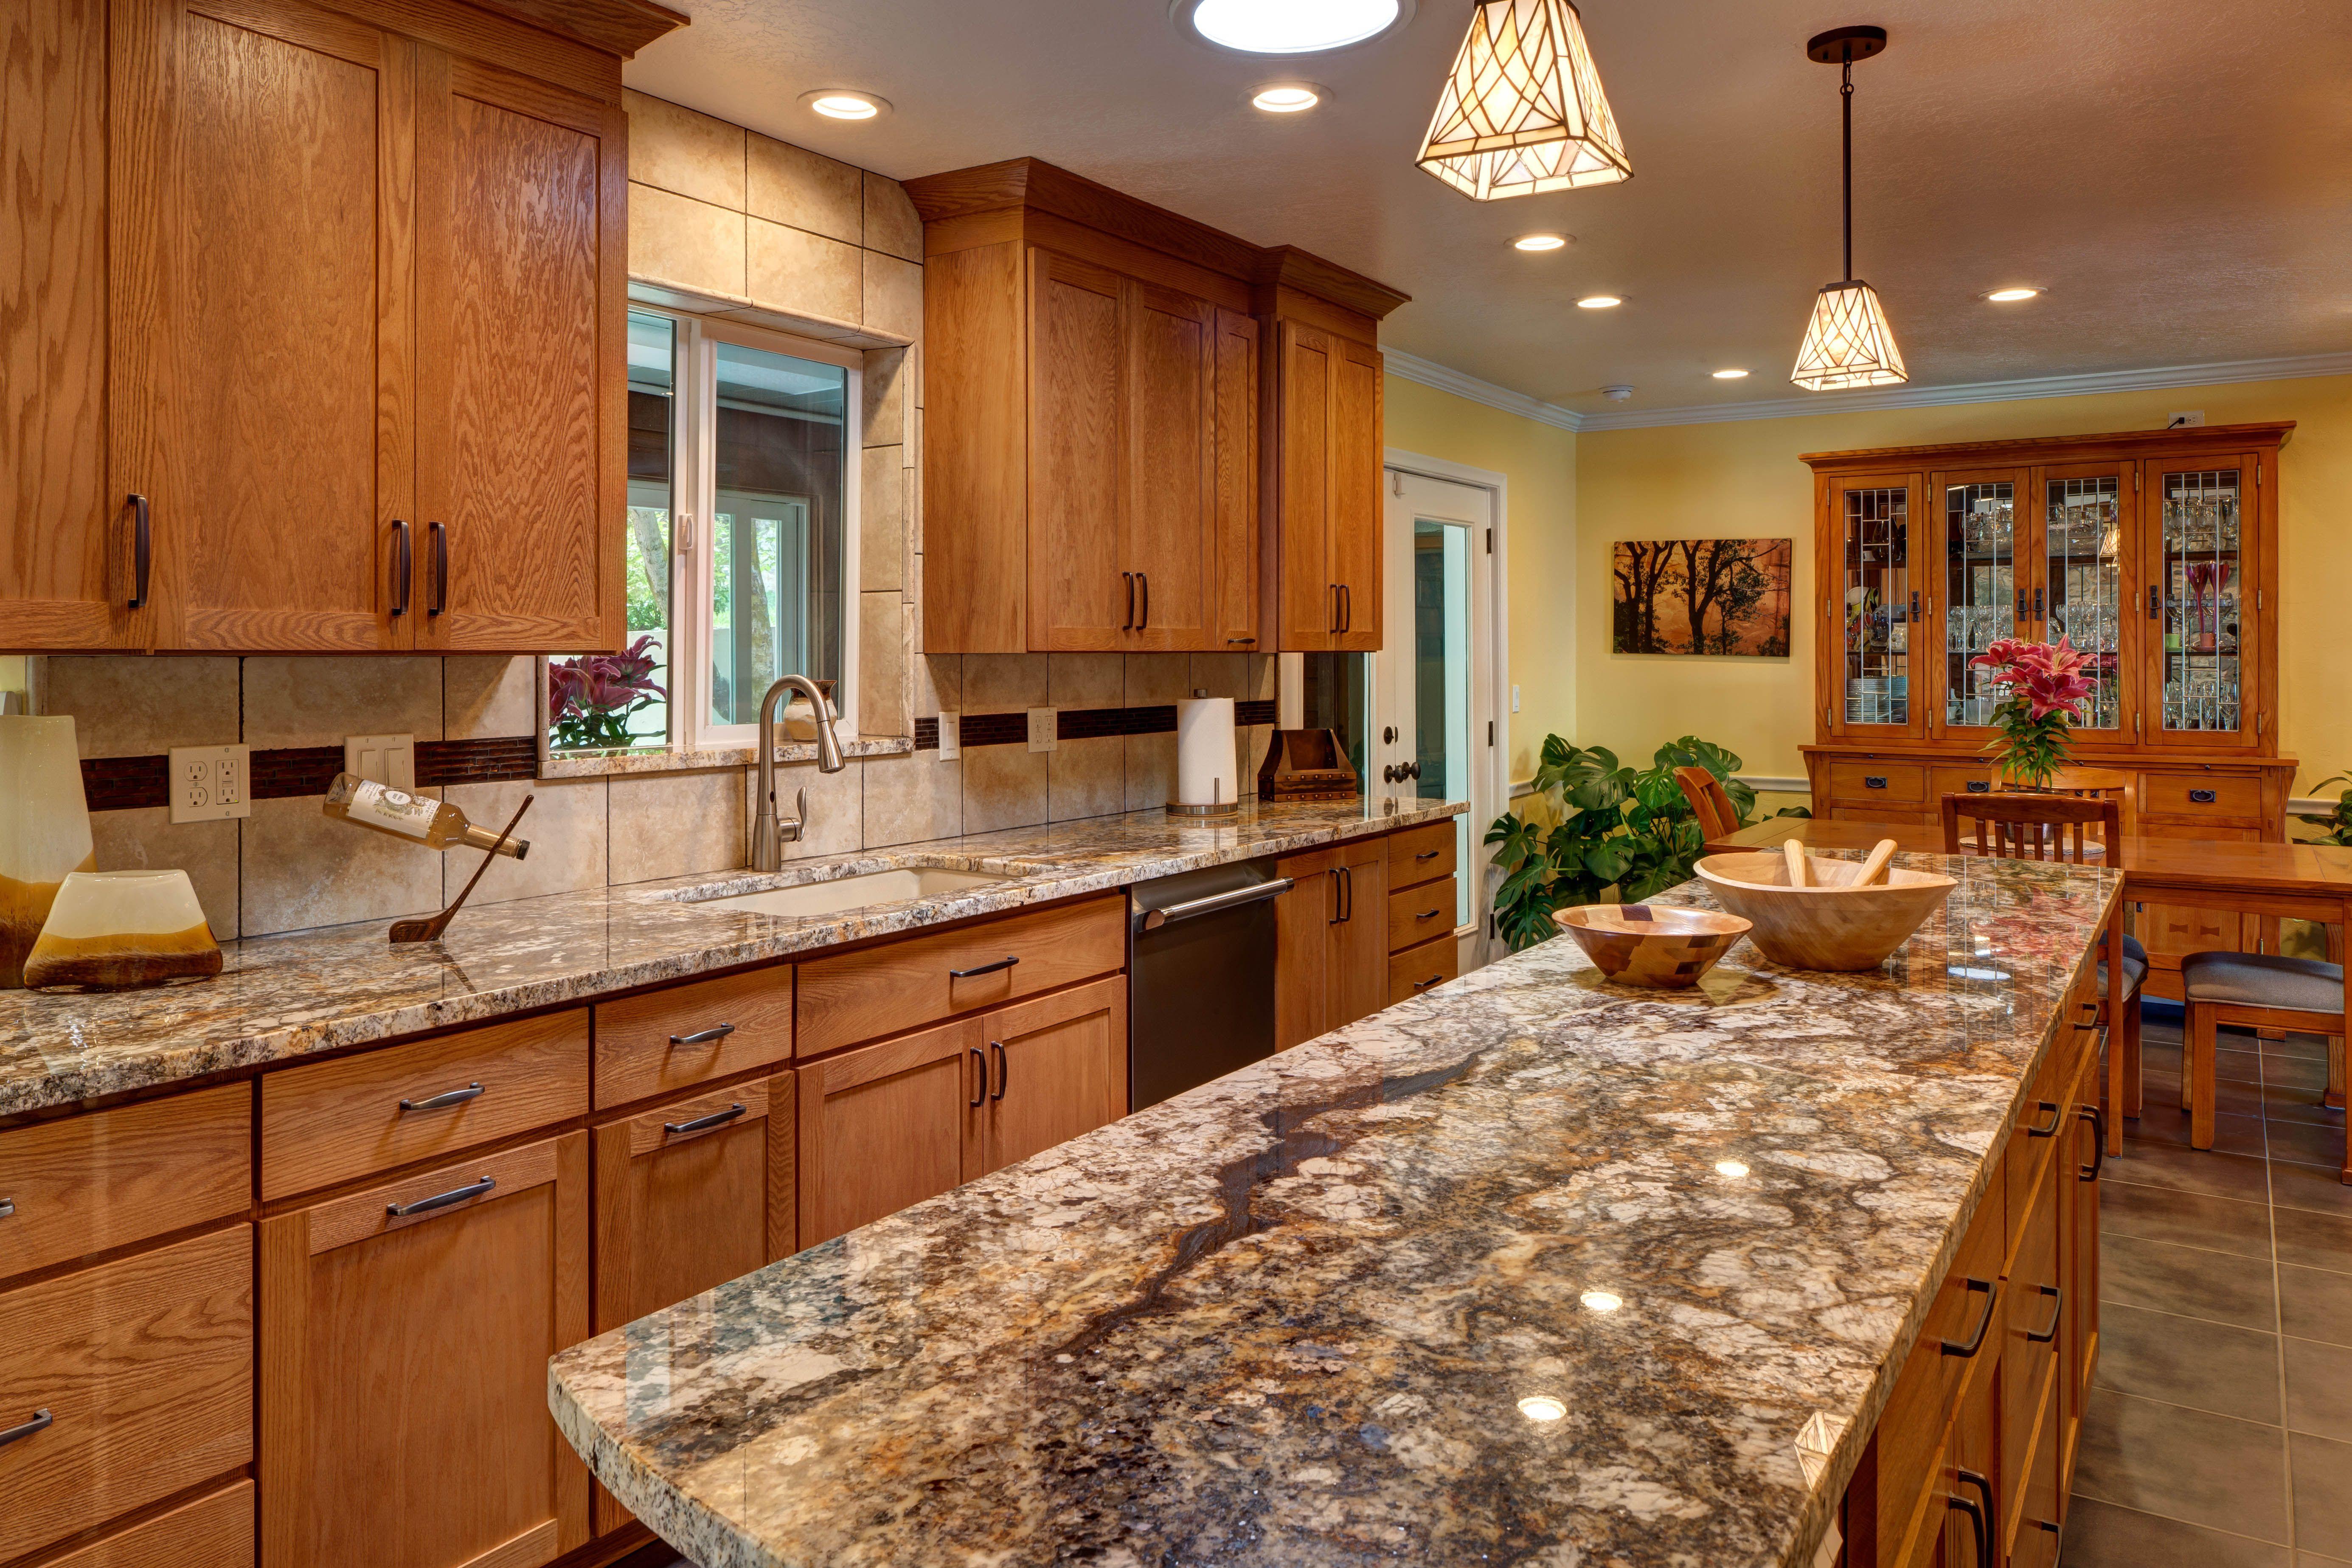 Kitchen Remodeling Arizona Betulari Granite From Arizona Tile In Salt Lake City Countertops